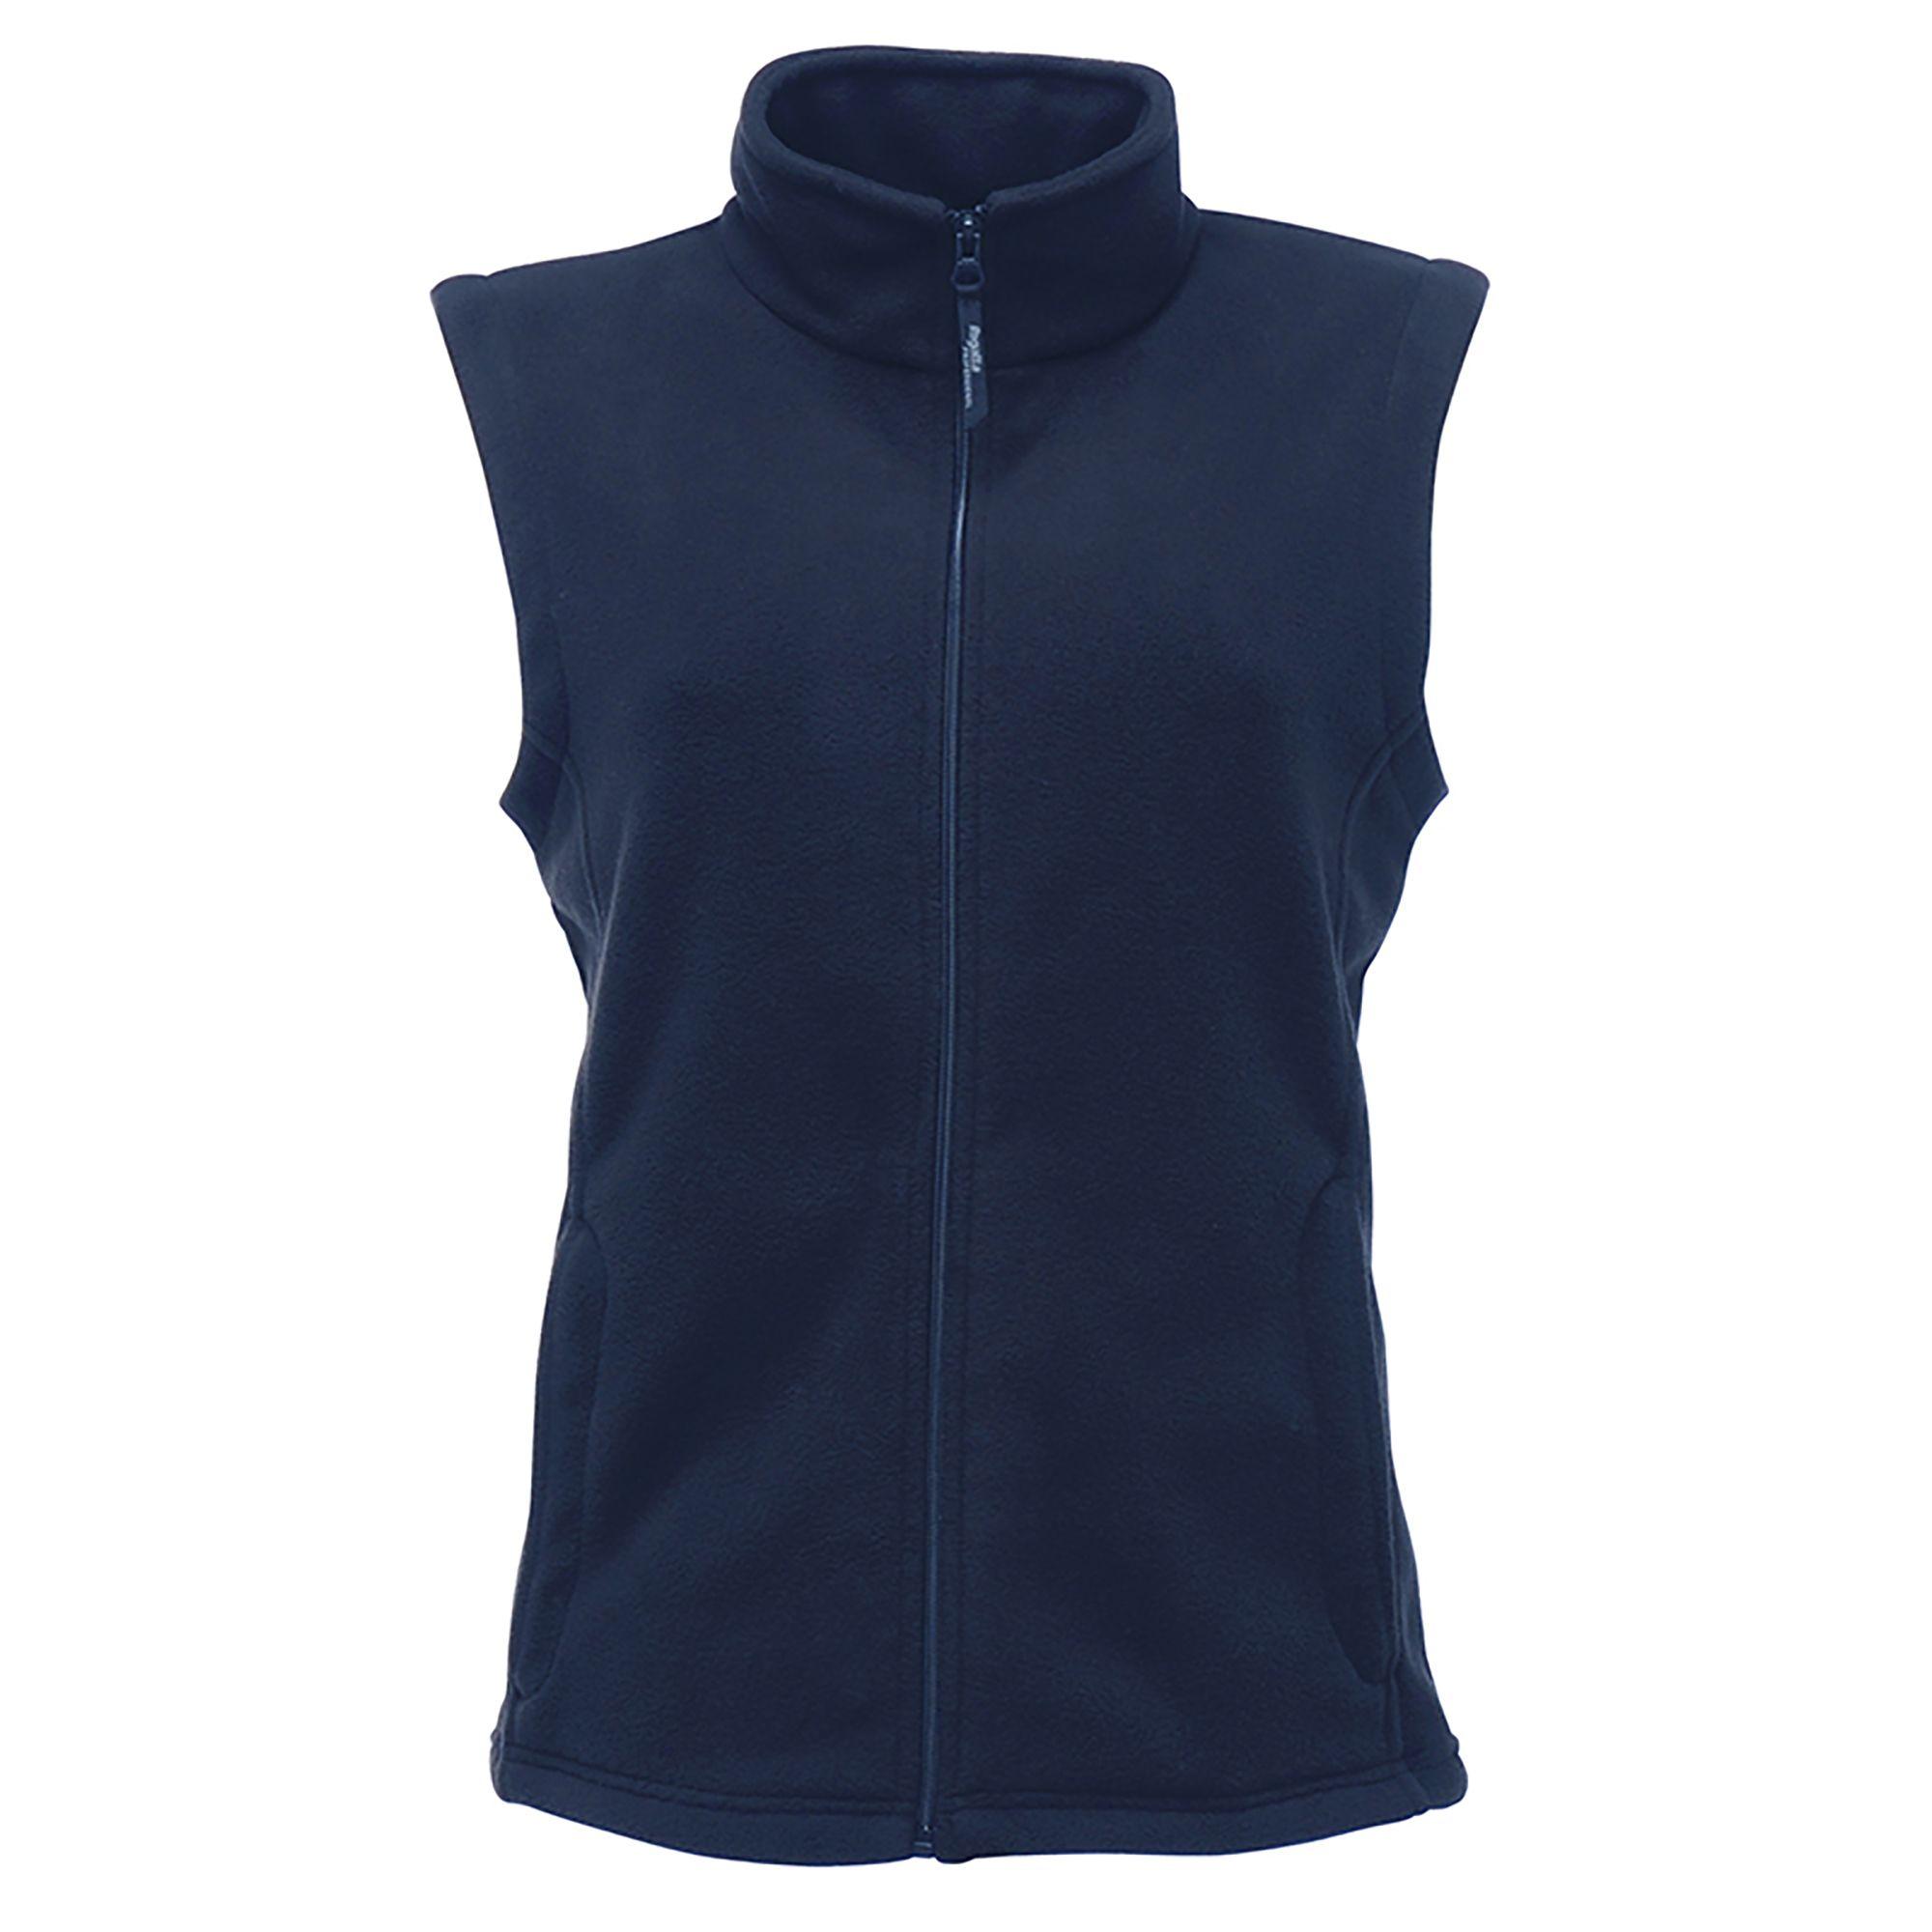 Regatta Womens/Ladies Micro Fleece Bodywarmer / Gilet